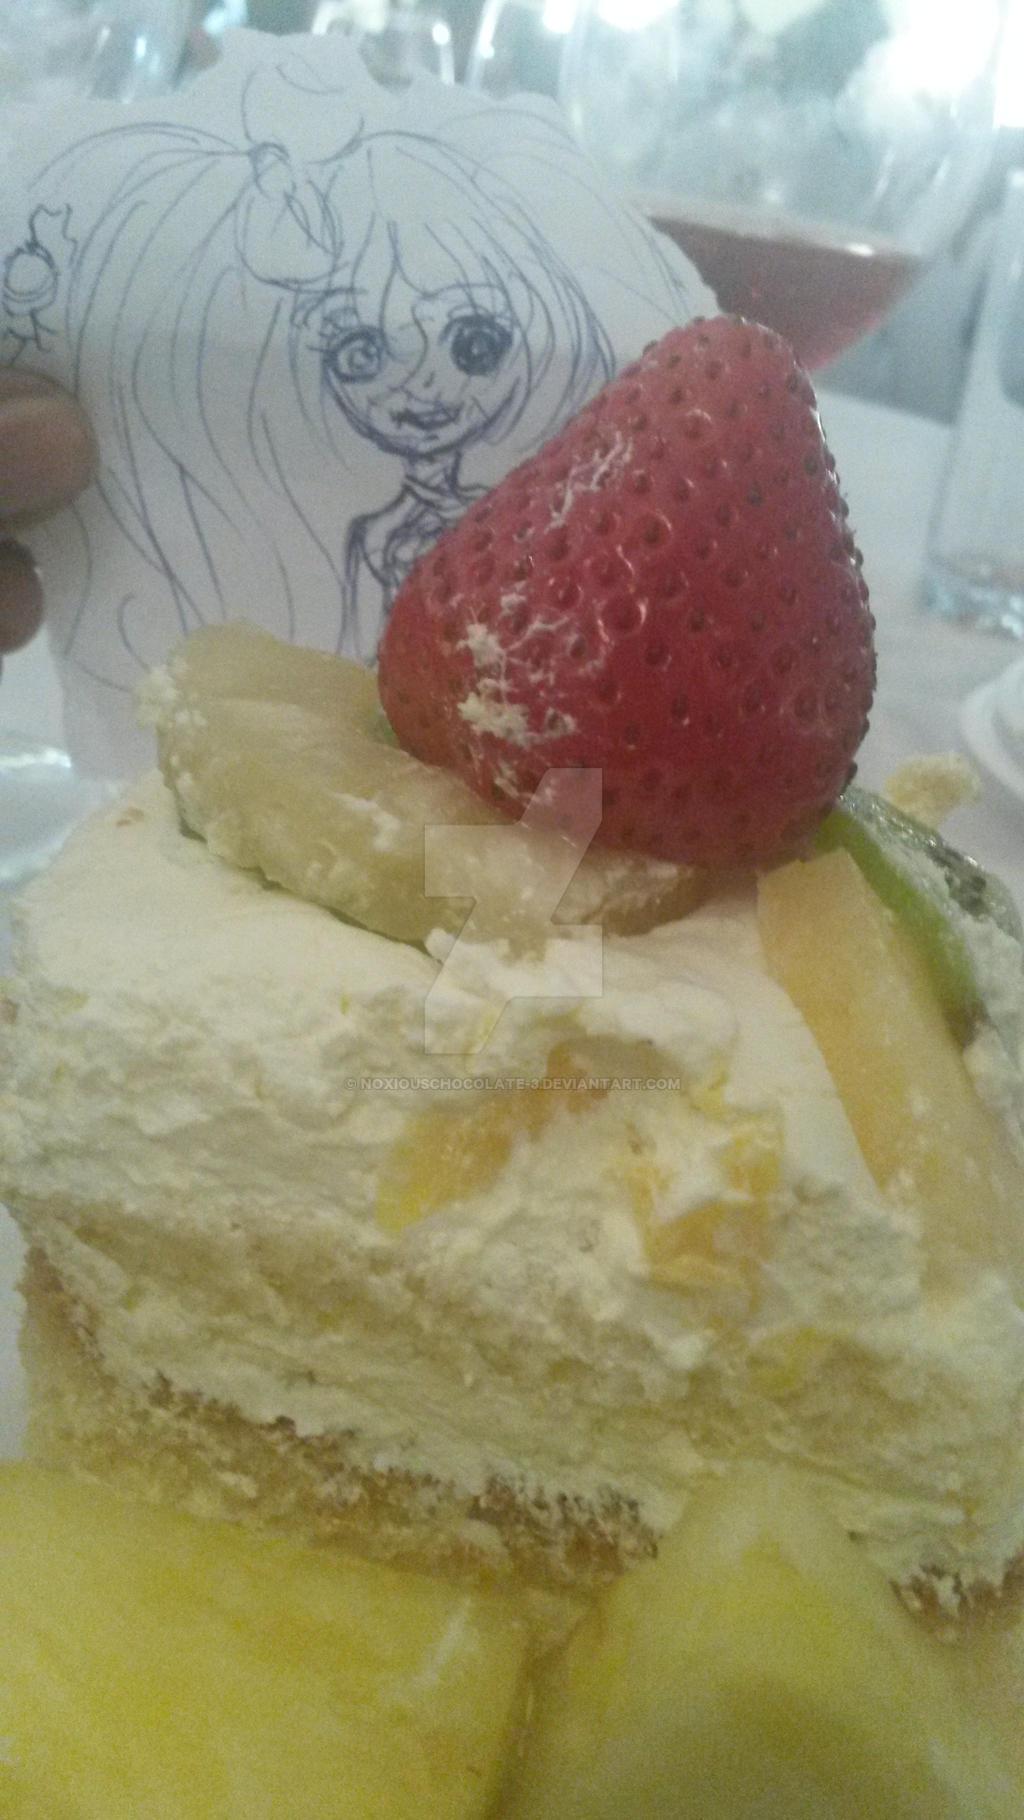 Wha- HEY GET AWAY FRO MY CAKE X[ by Noxiouschocolate-3